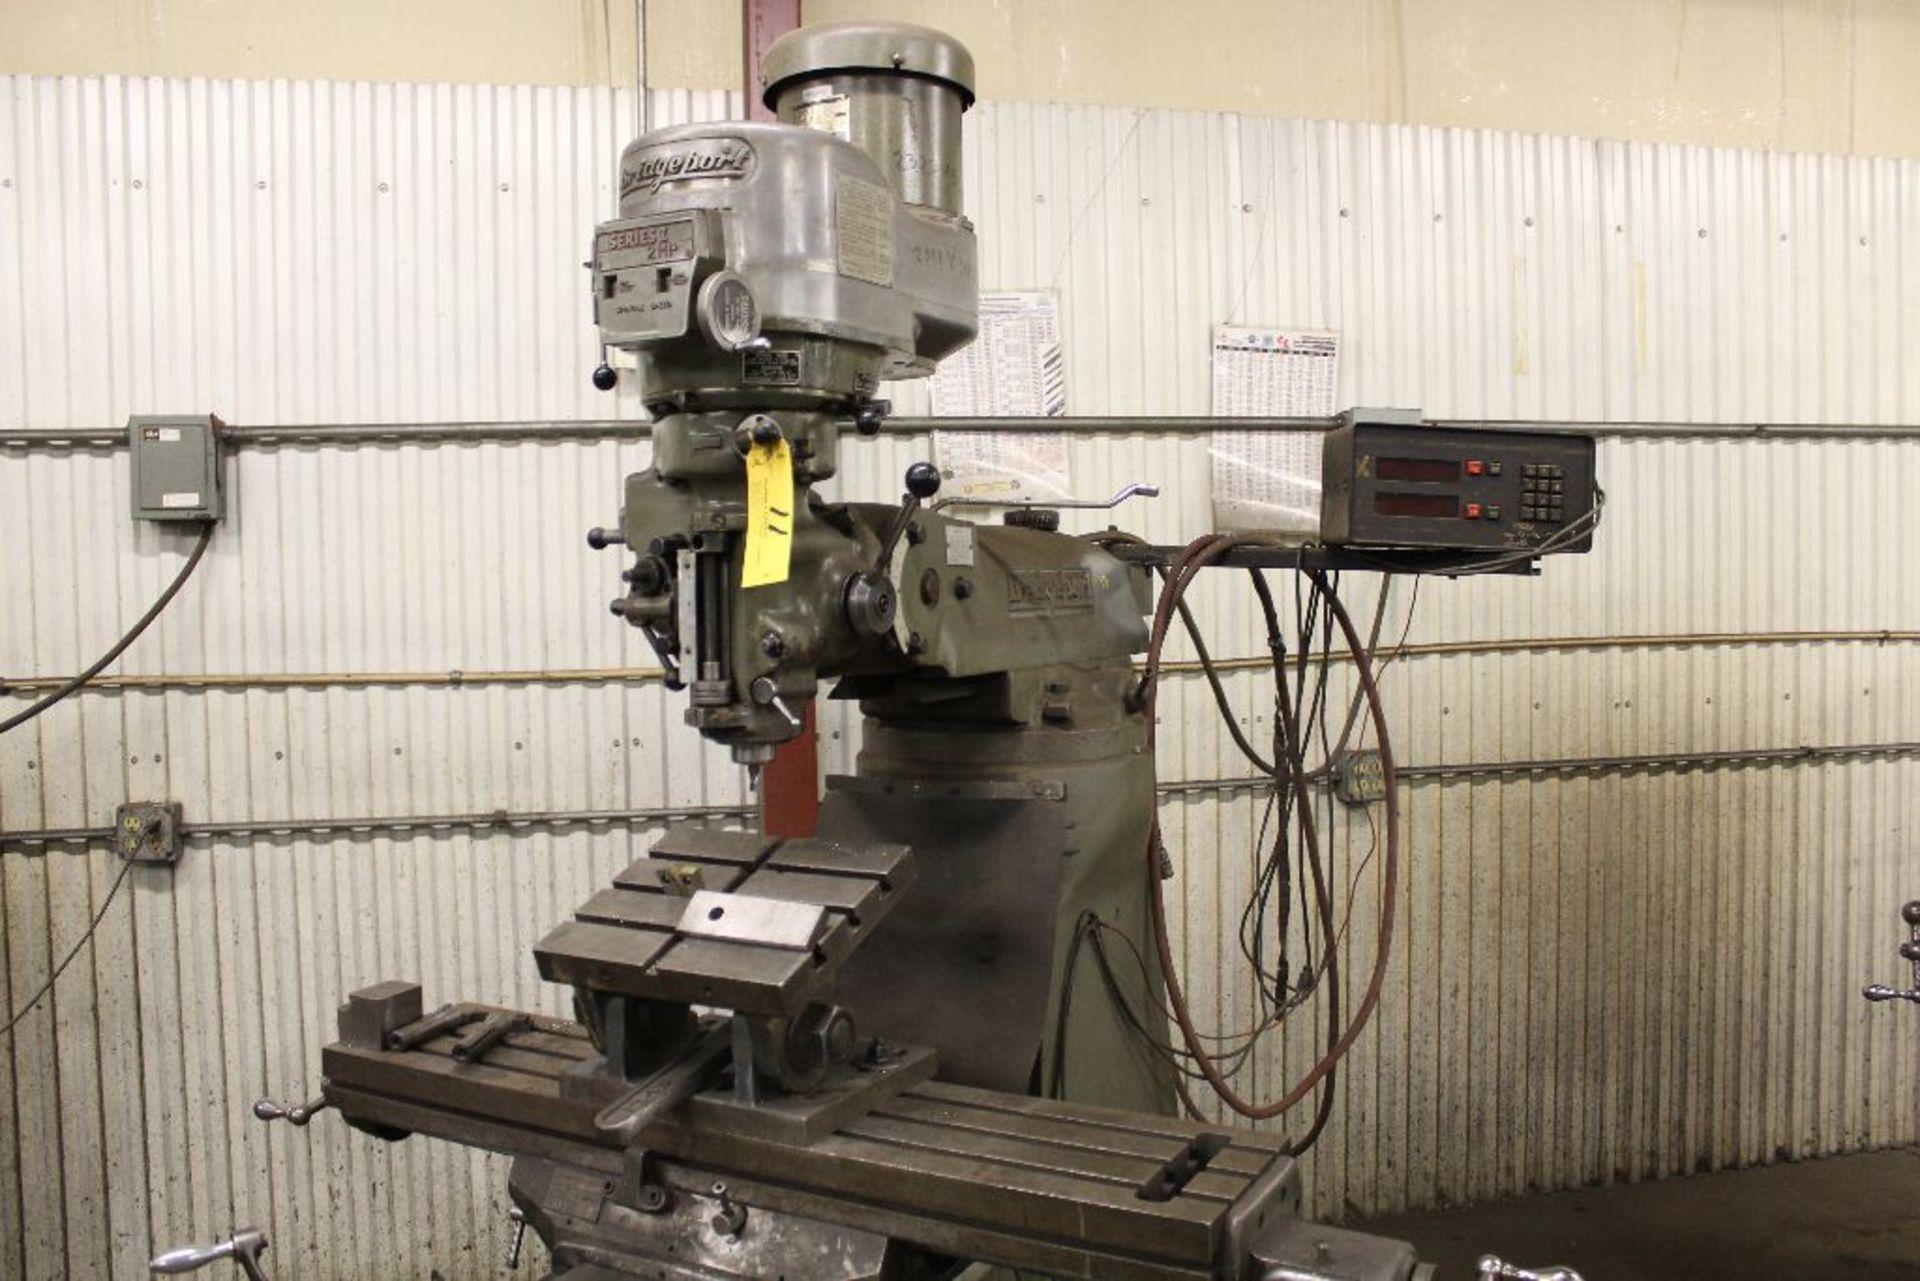 Lot 011 - Bridgeport vertical mill Series II, model 12-BR, sn 19162, 2 hp, power feed, Sargon digital